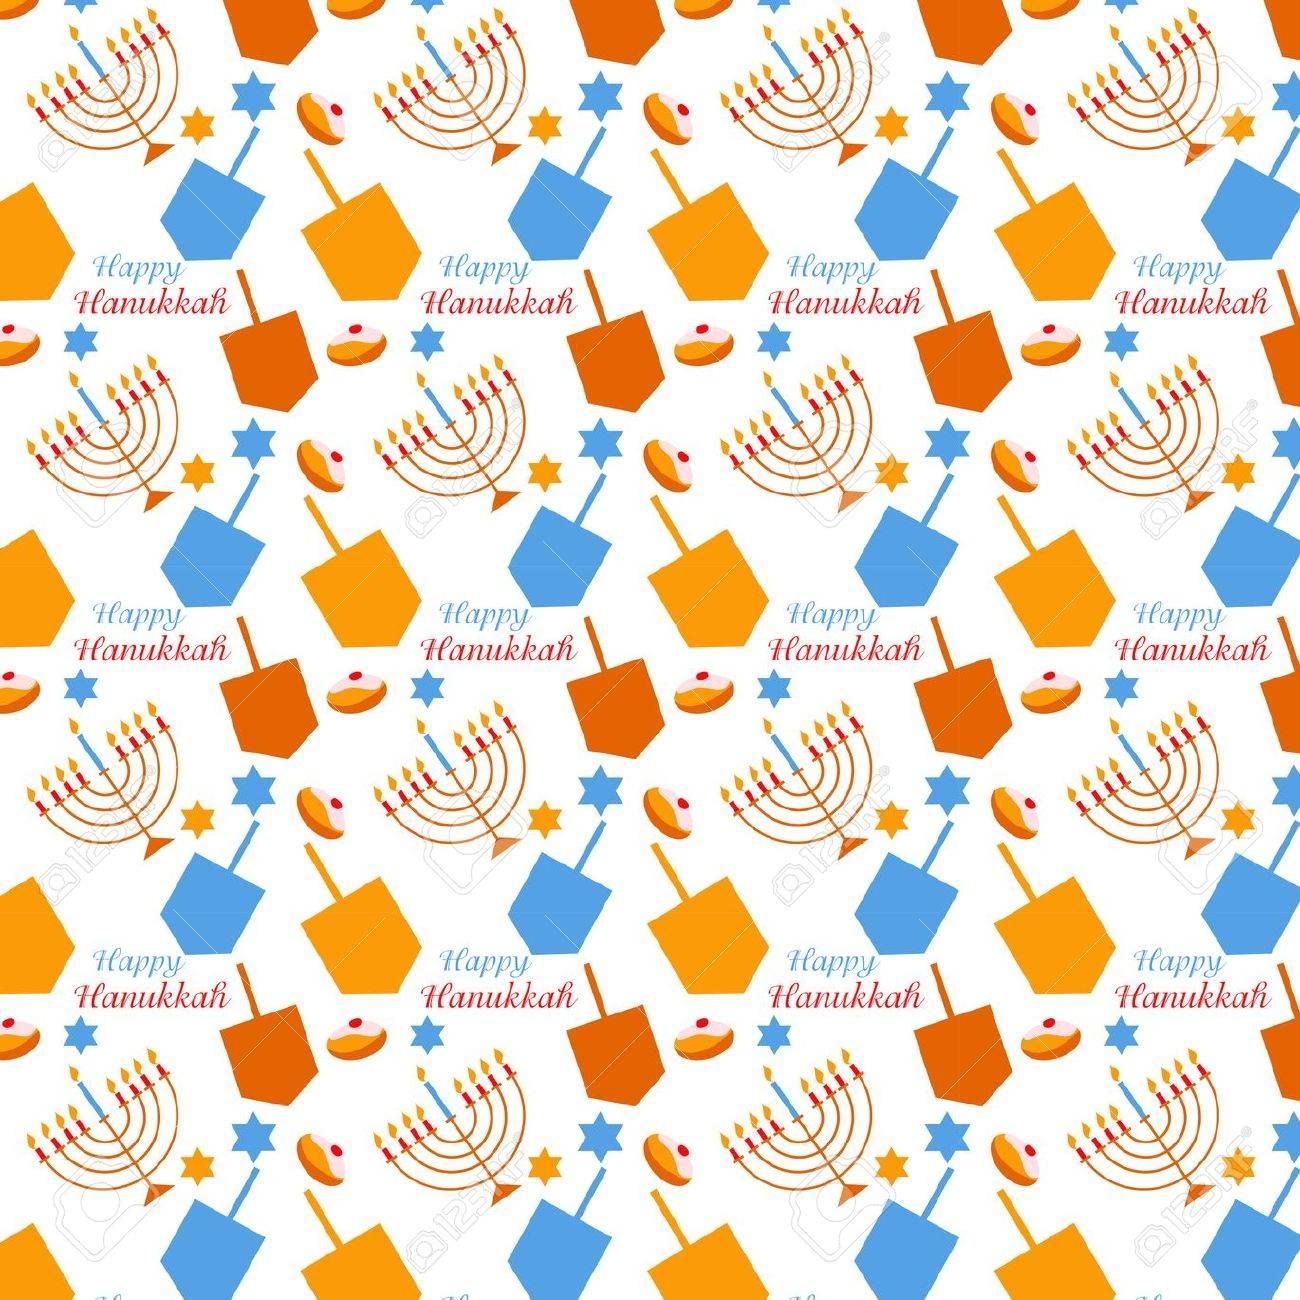 Uncategorized Chanukah Symbols pattern with hanukkah symbols colorful vector illustration stock 32424958